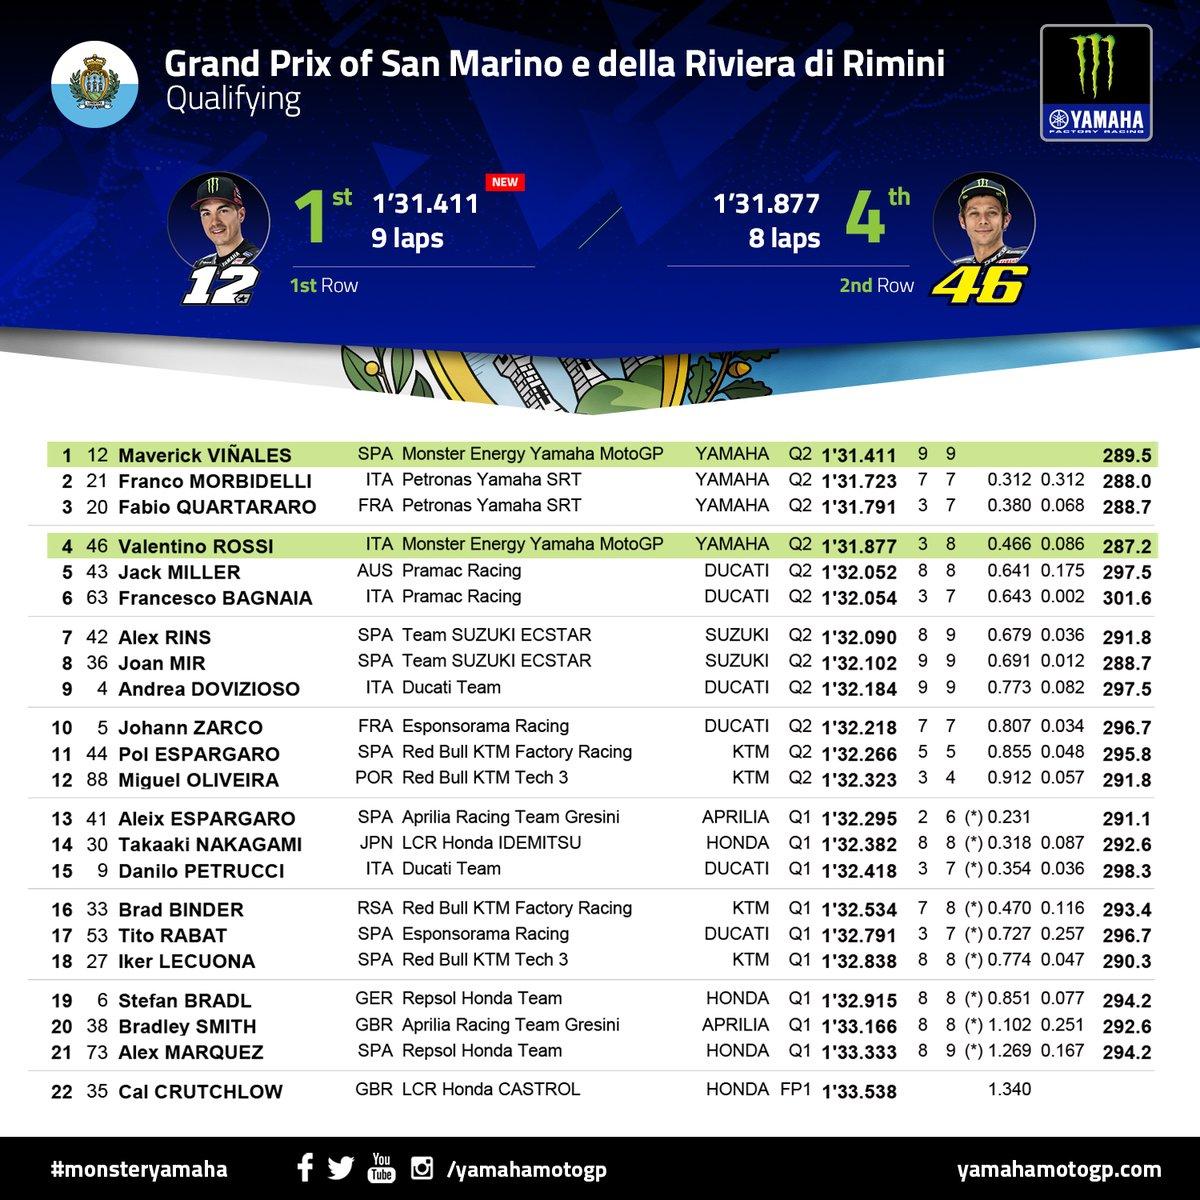 Monster Energy Yamaha Motogp On Twitter Sanmarinogp Qualifying Results 1st Mvkoficial12 New All Time Lap Record 4th Valeyellow46 Monsteryamaha Motogp Https T Co Rbicdjkpbj